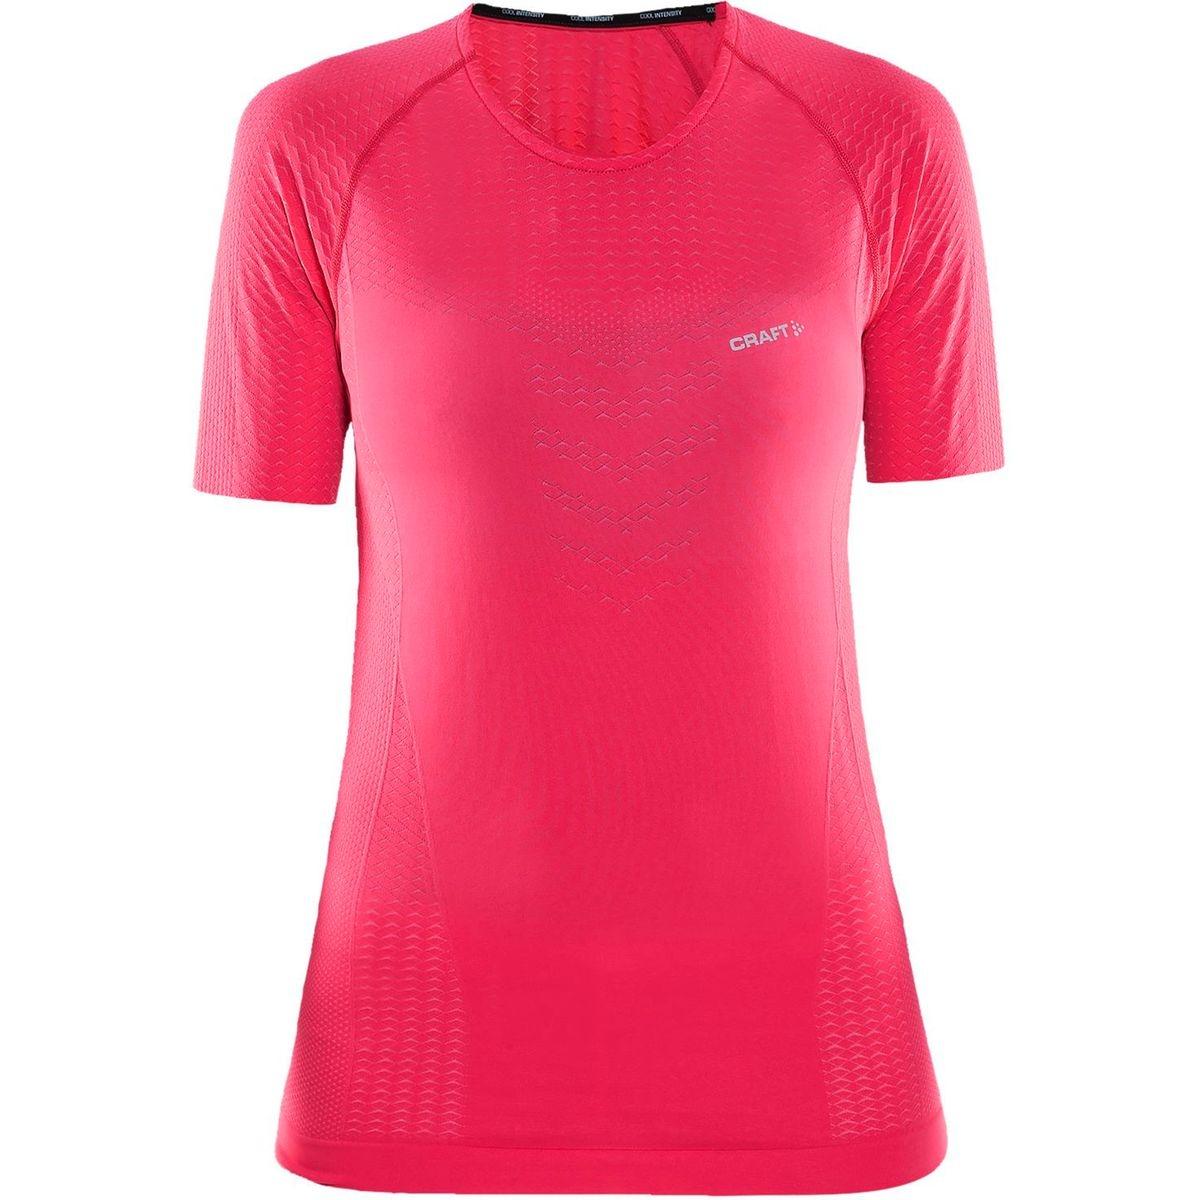 Cool Intensity - Sous-vêtement - rose